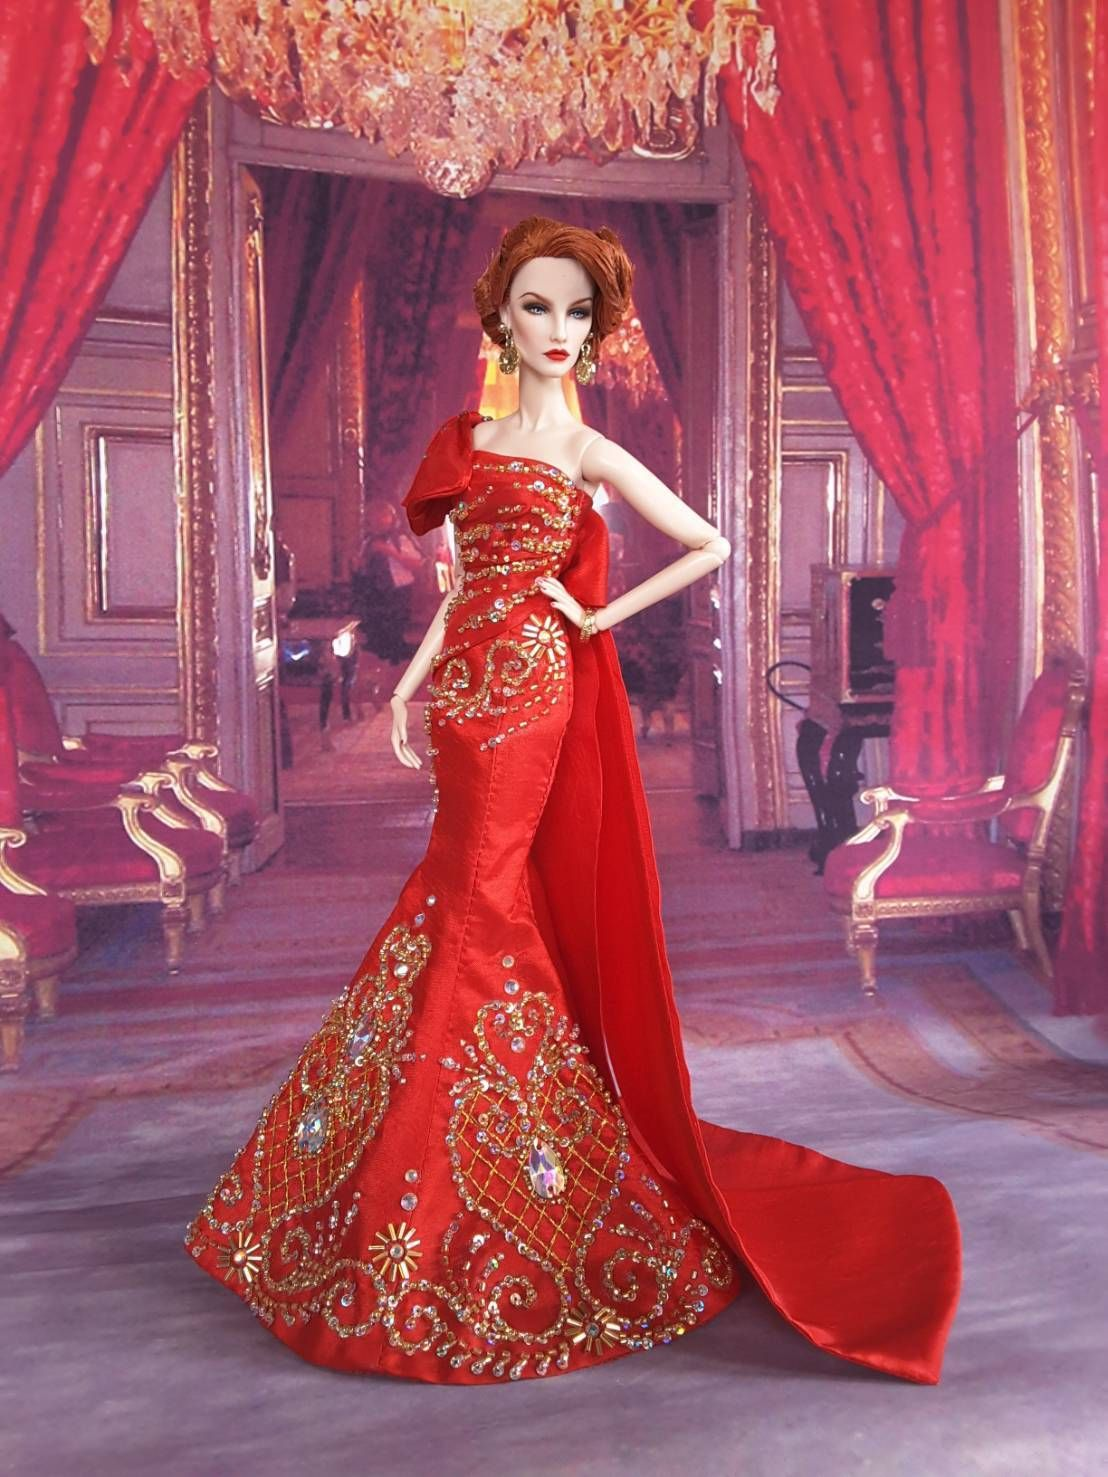 Amon Design Gown Outfit Dress Fashion Royalty Silkstone Barbie Model ...